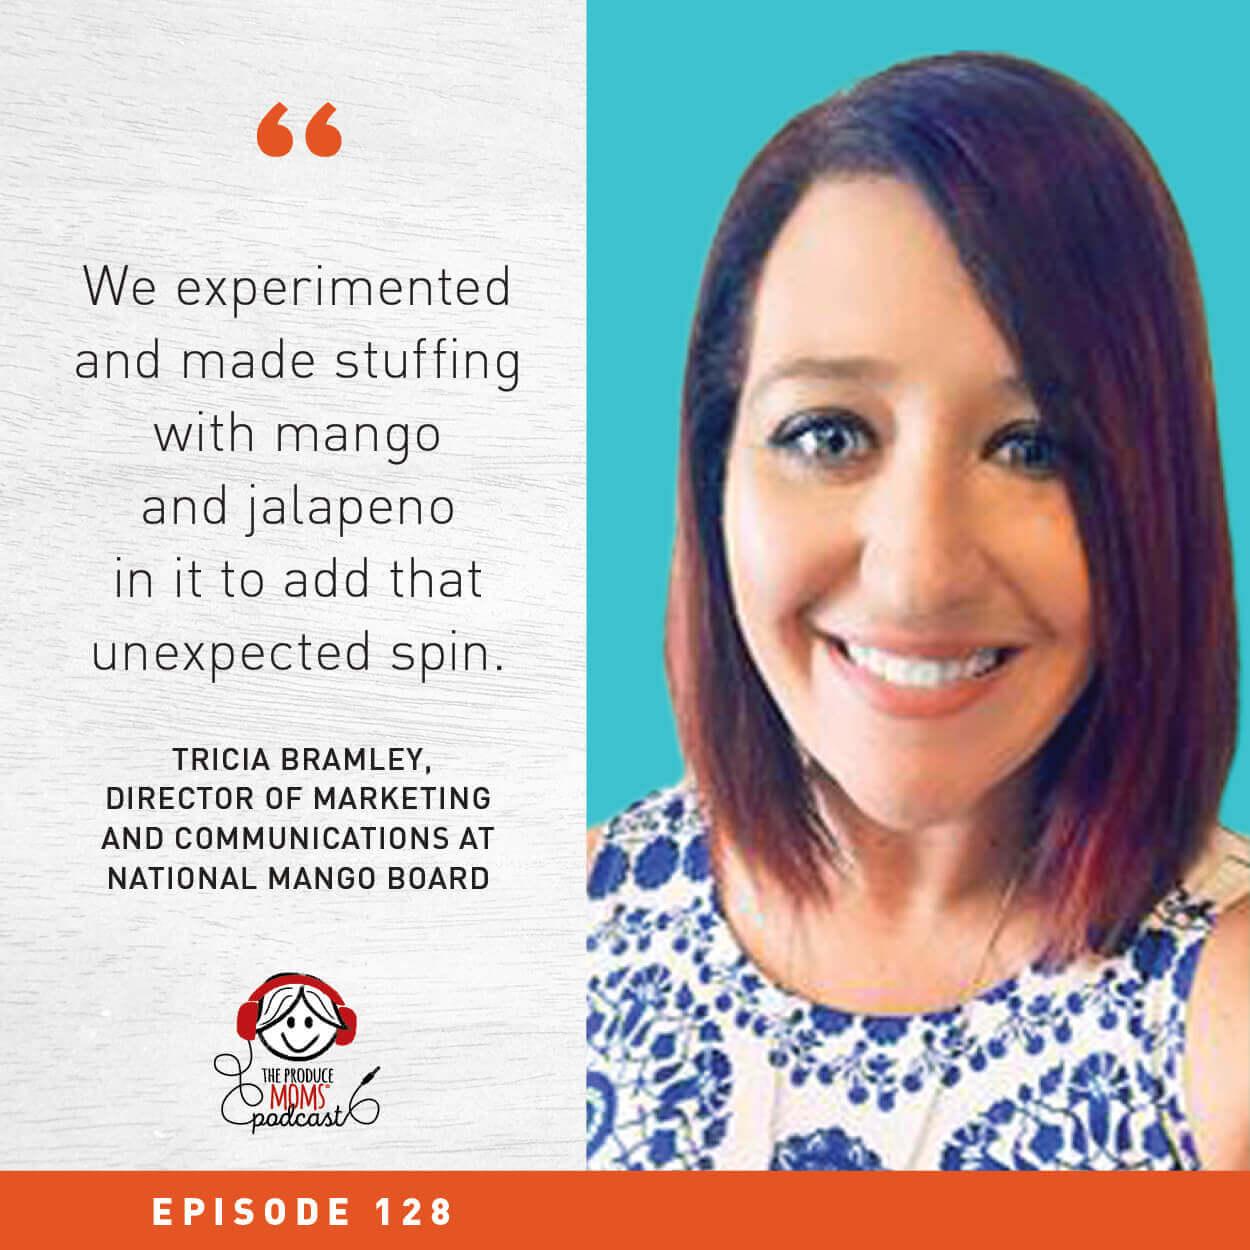 Creative Ideas from National Mango Board